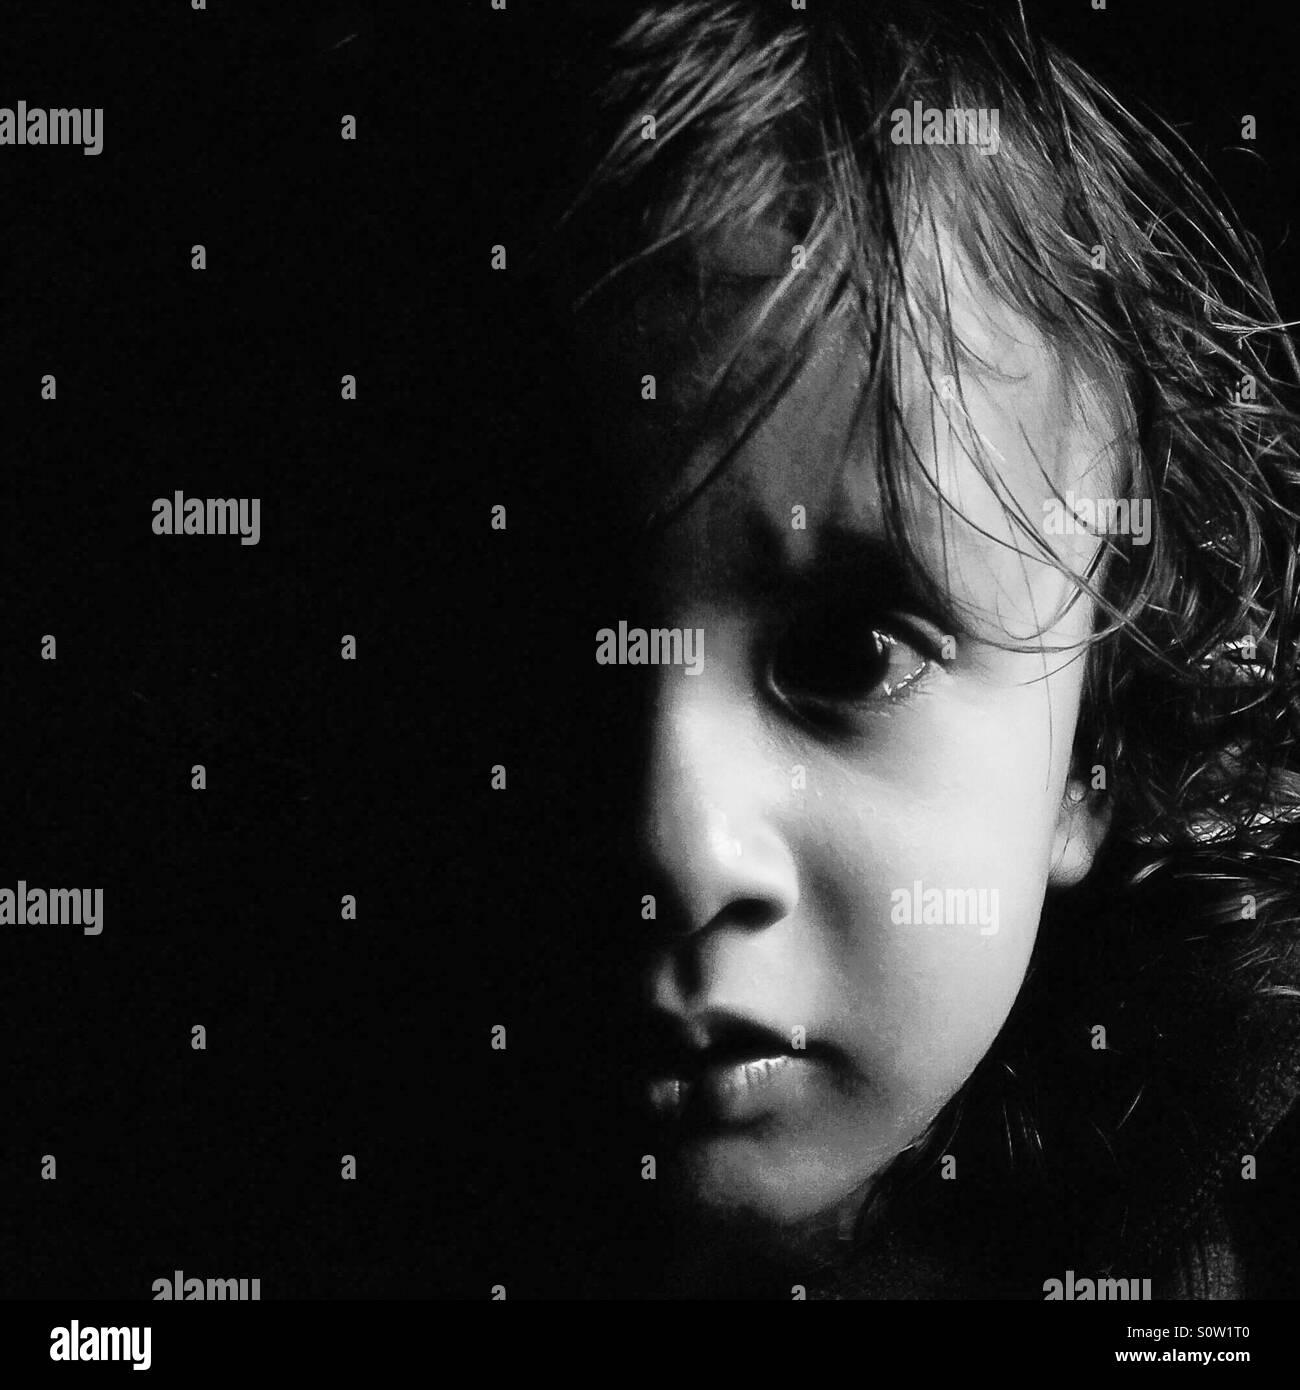 Salvar la niñez Imagen De Stock